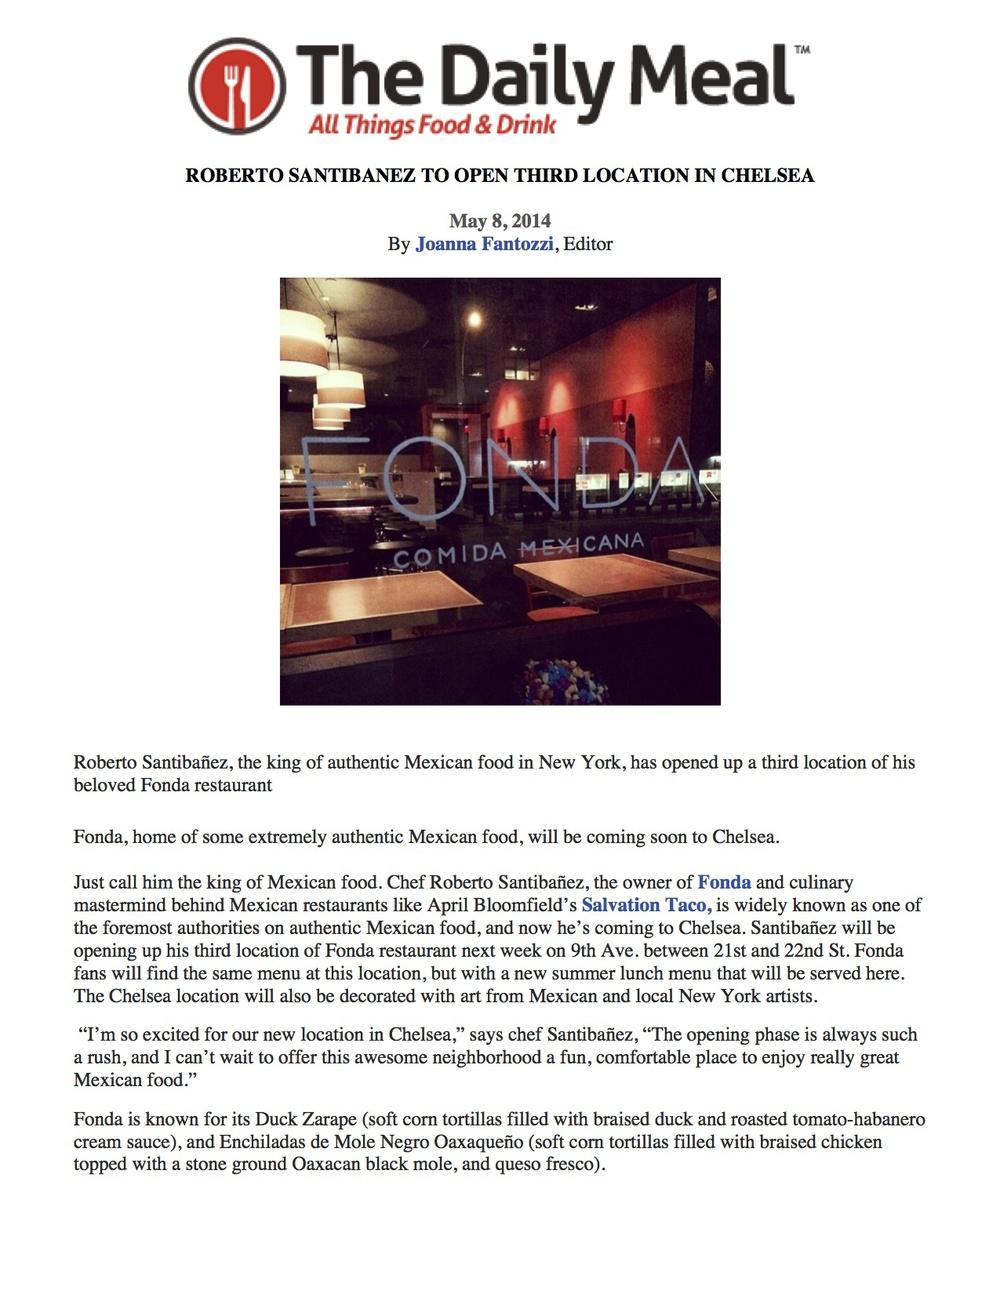 FONDA - TheDailyMeal - 5.8.14.jpg